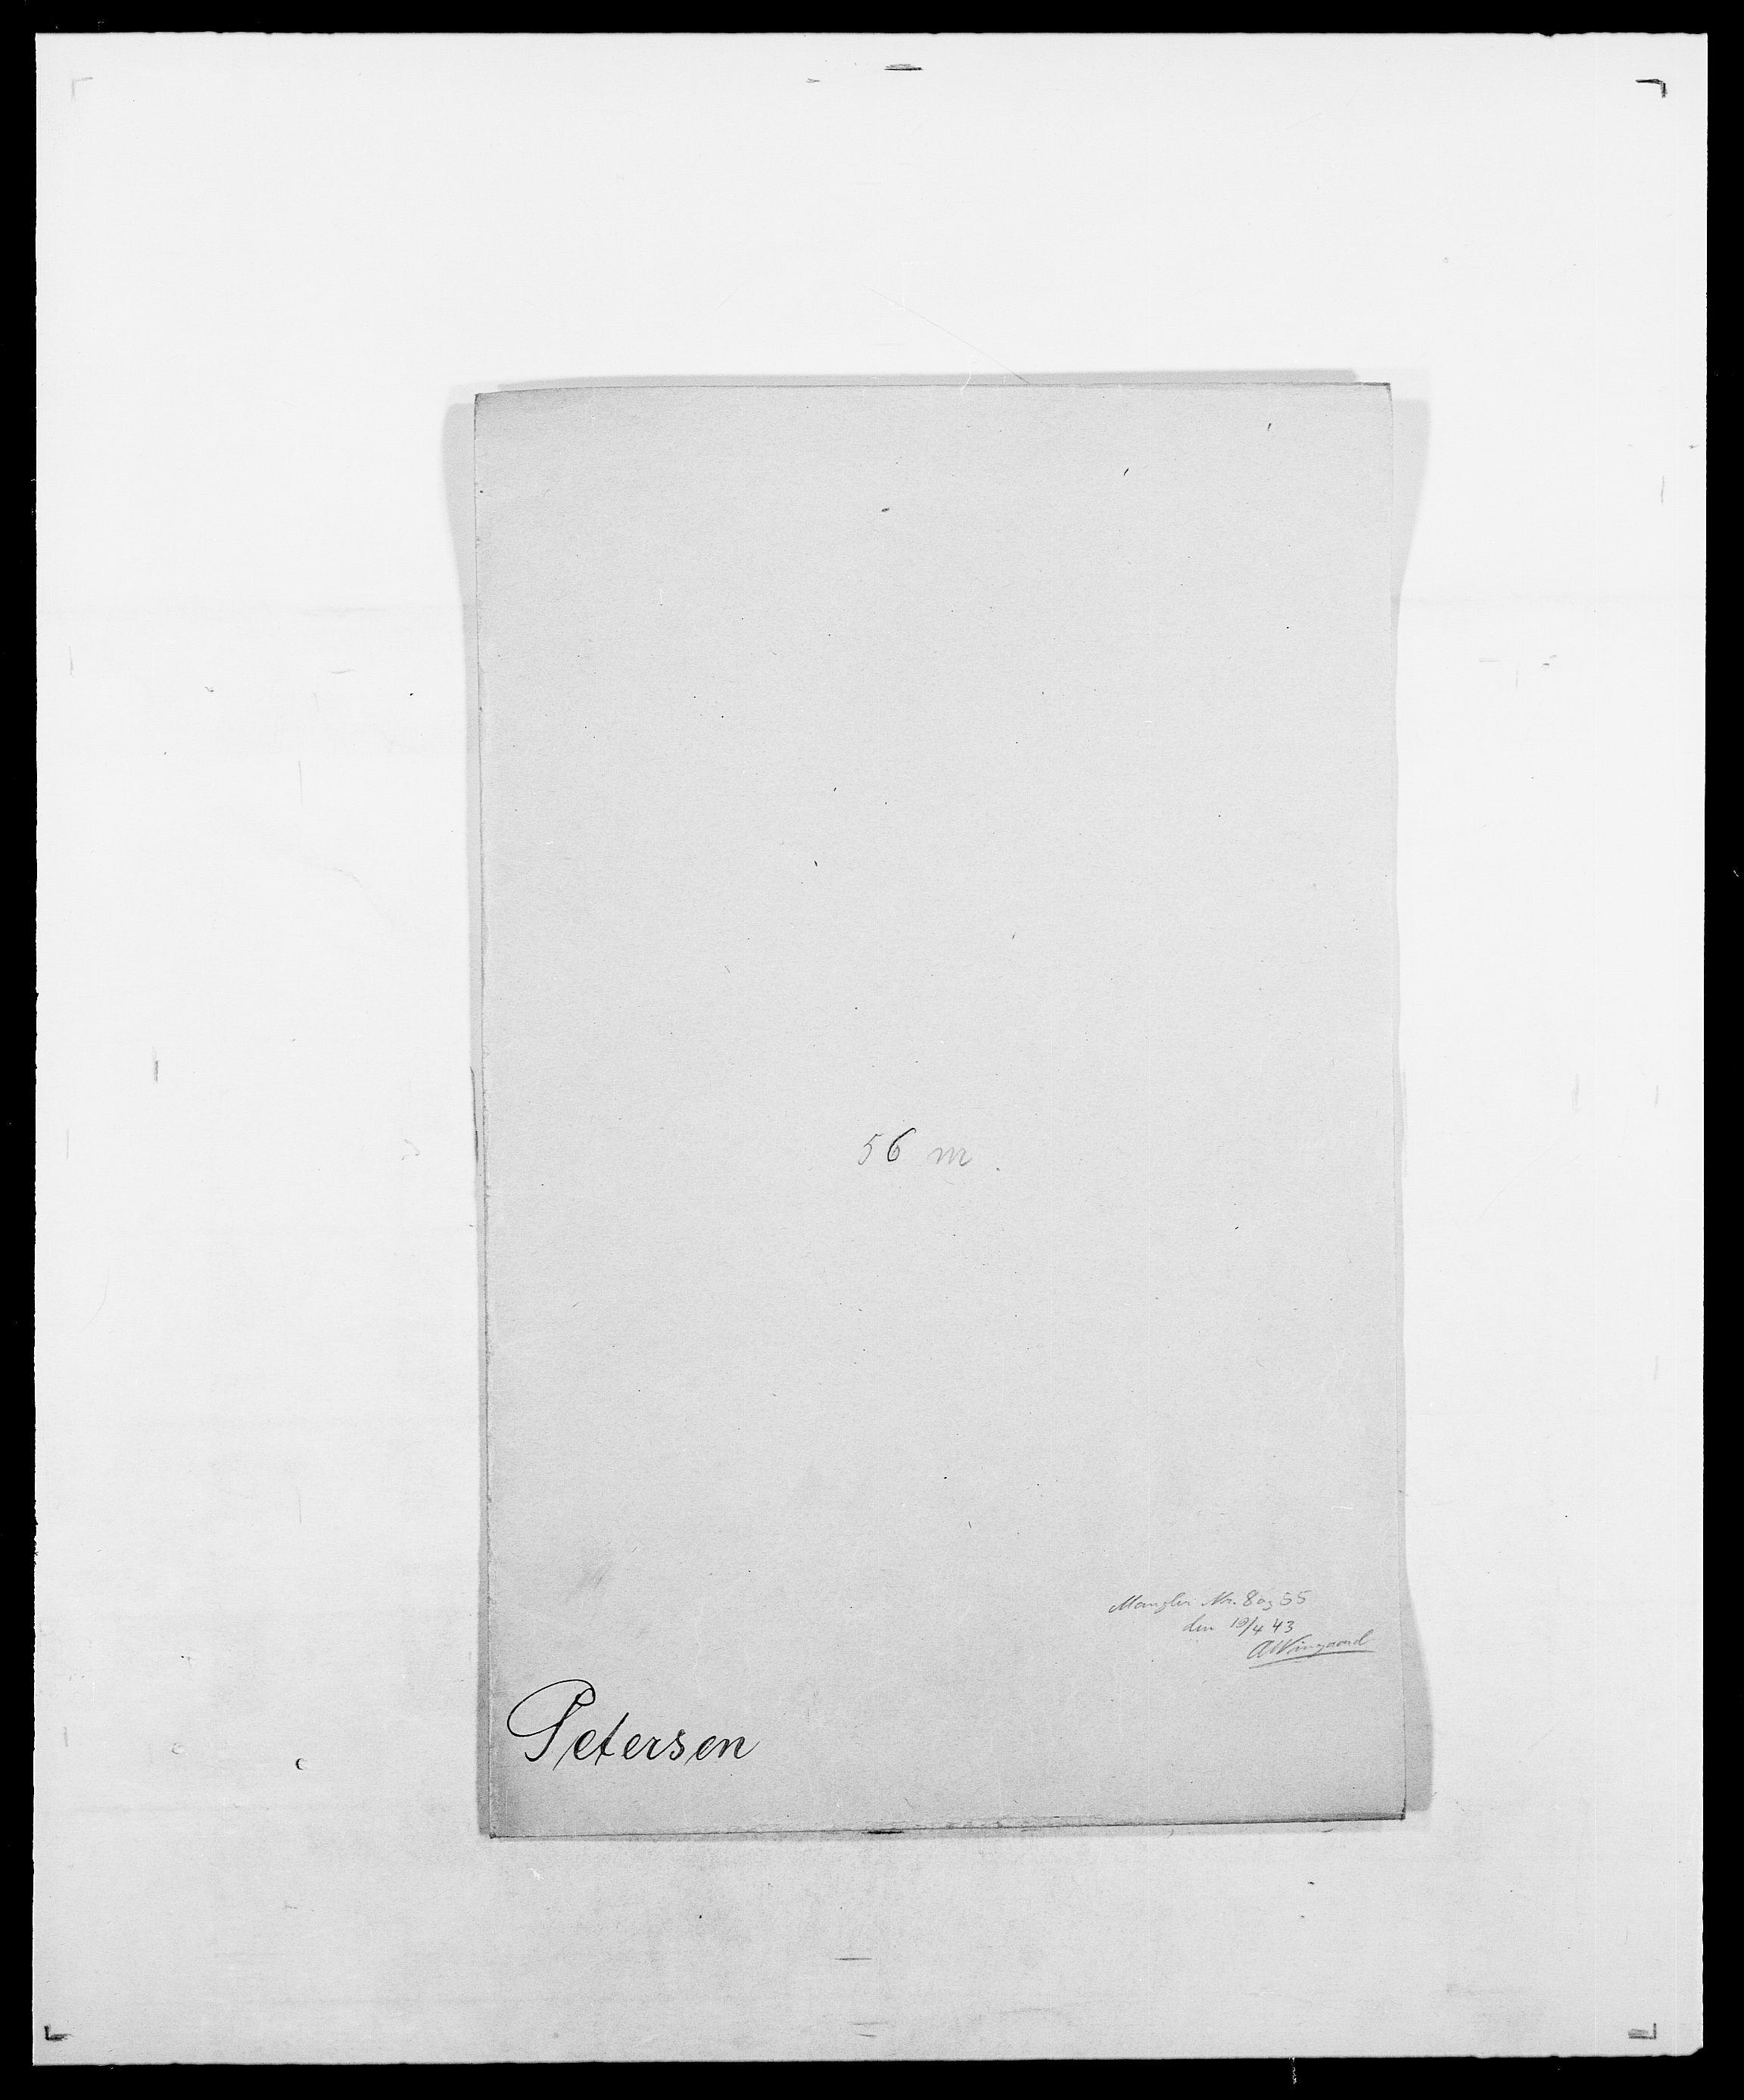 SAO, Delgobe, Charles Antoine - samling, D/Da/L0030: Paars - Pittelkov, s. 386